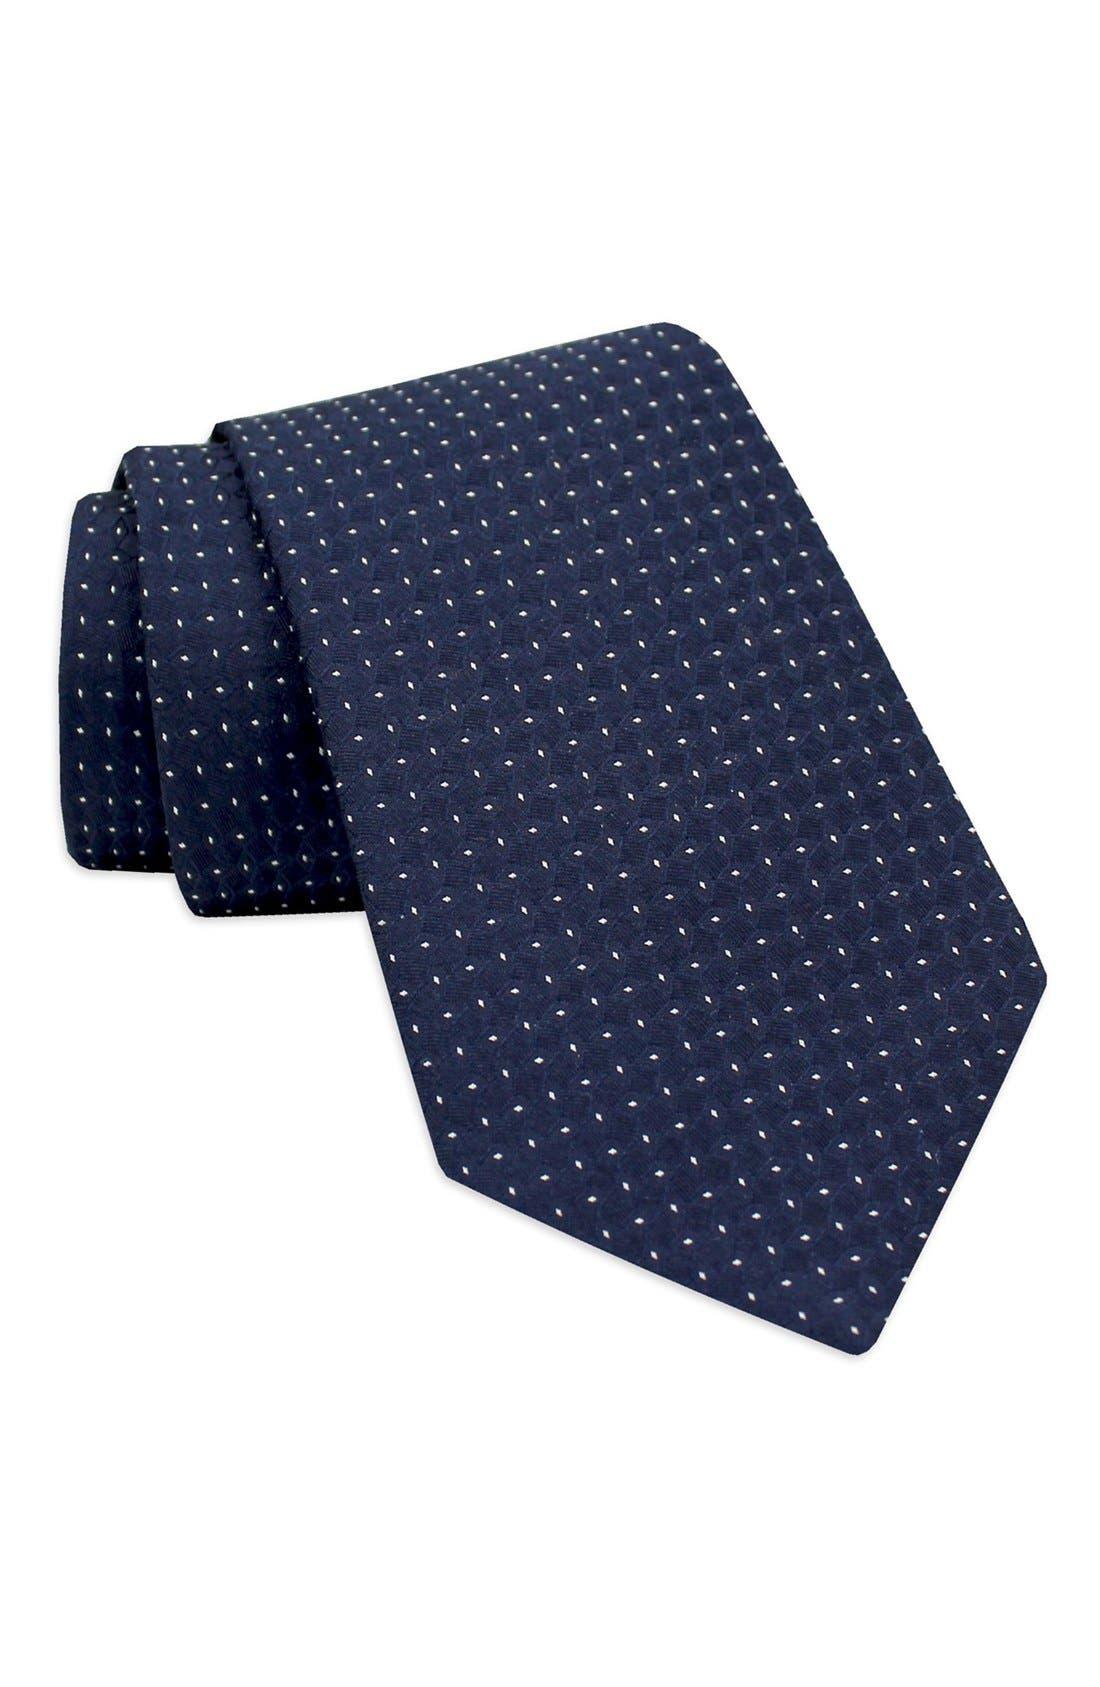 Main Image - Gitman Dot Woven Silk Tie